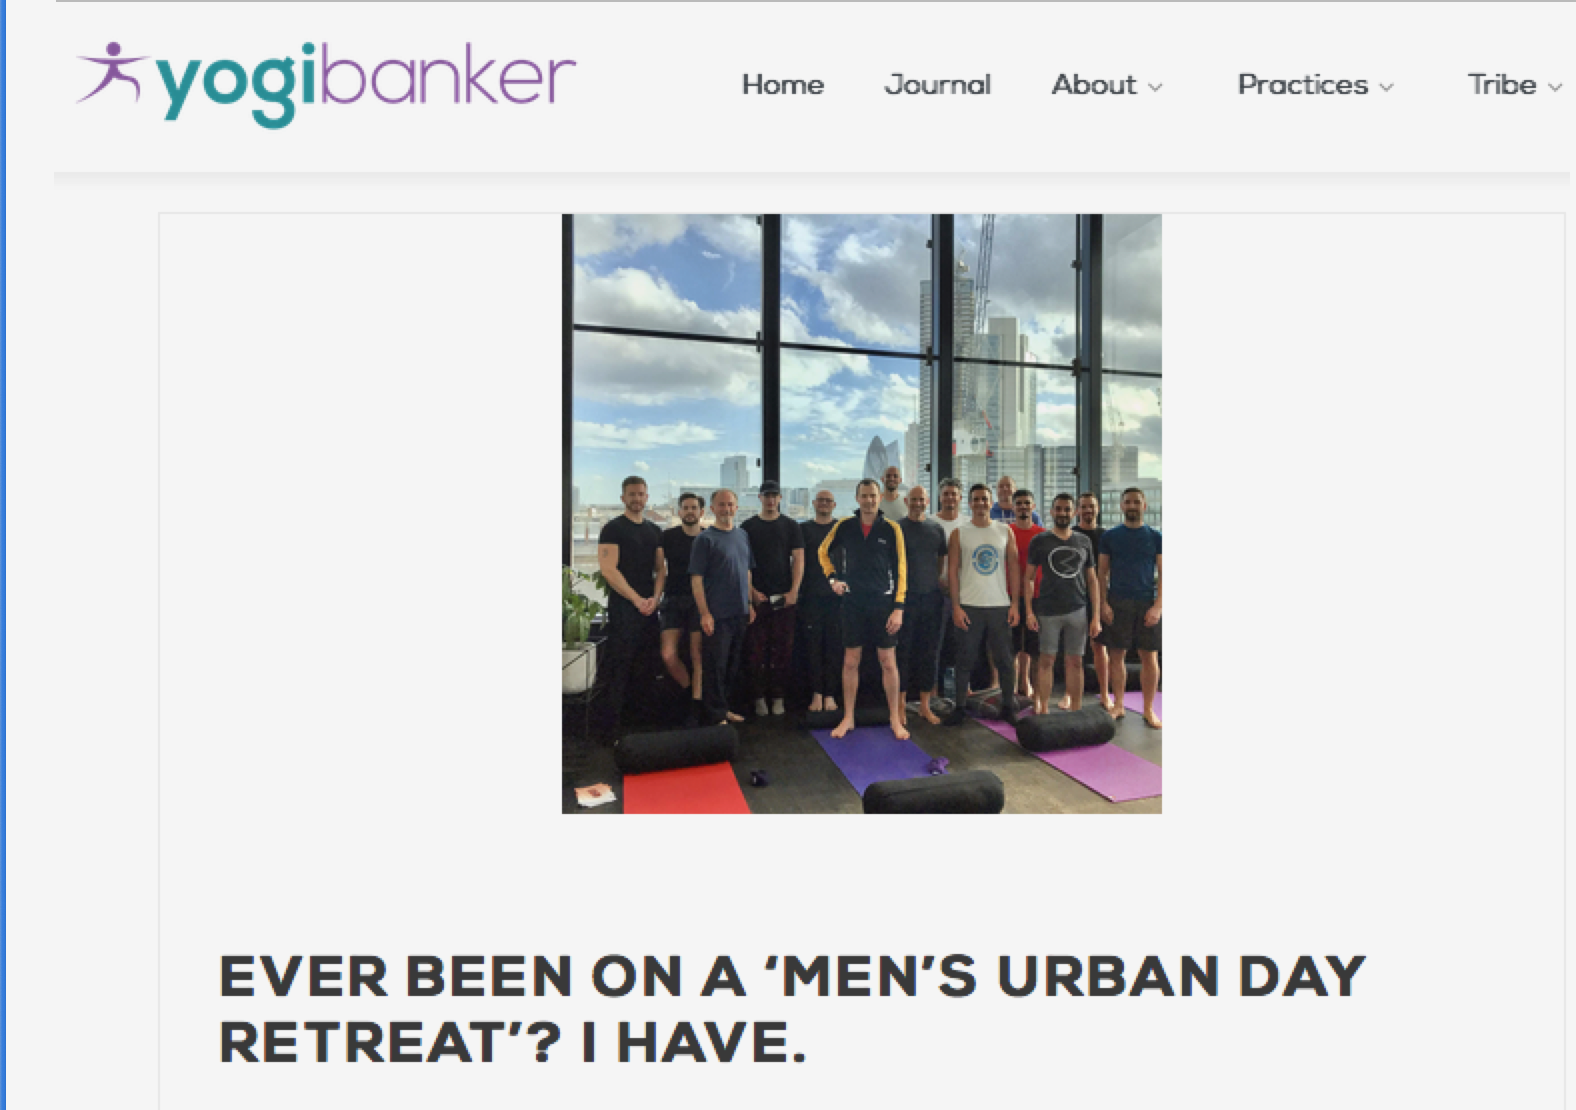 Yogibanker.com – Ever Been On A 'Men's Urban Day Retreat'? I Have.